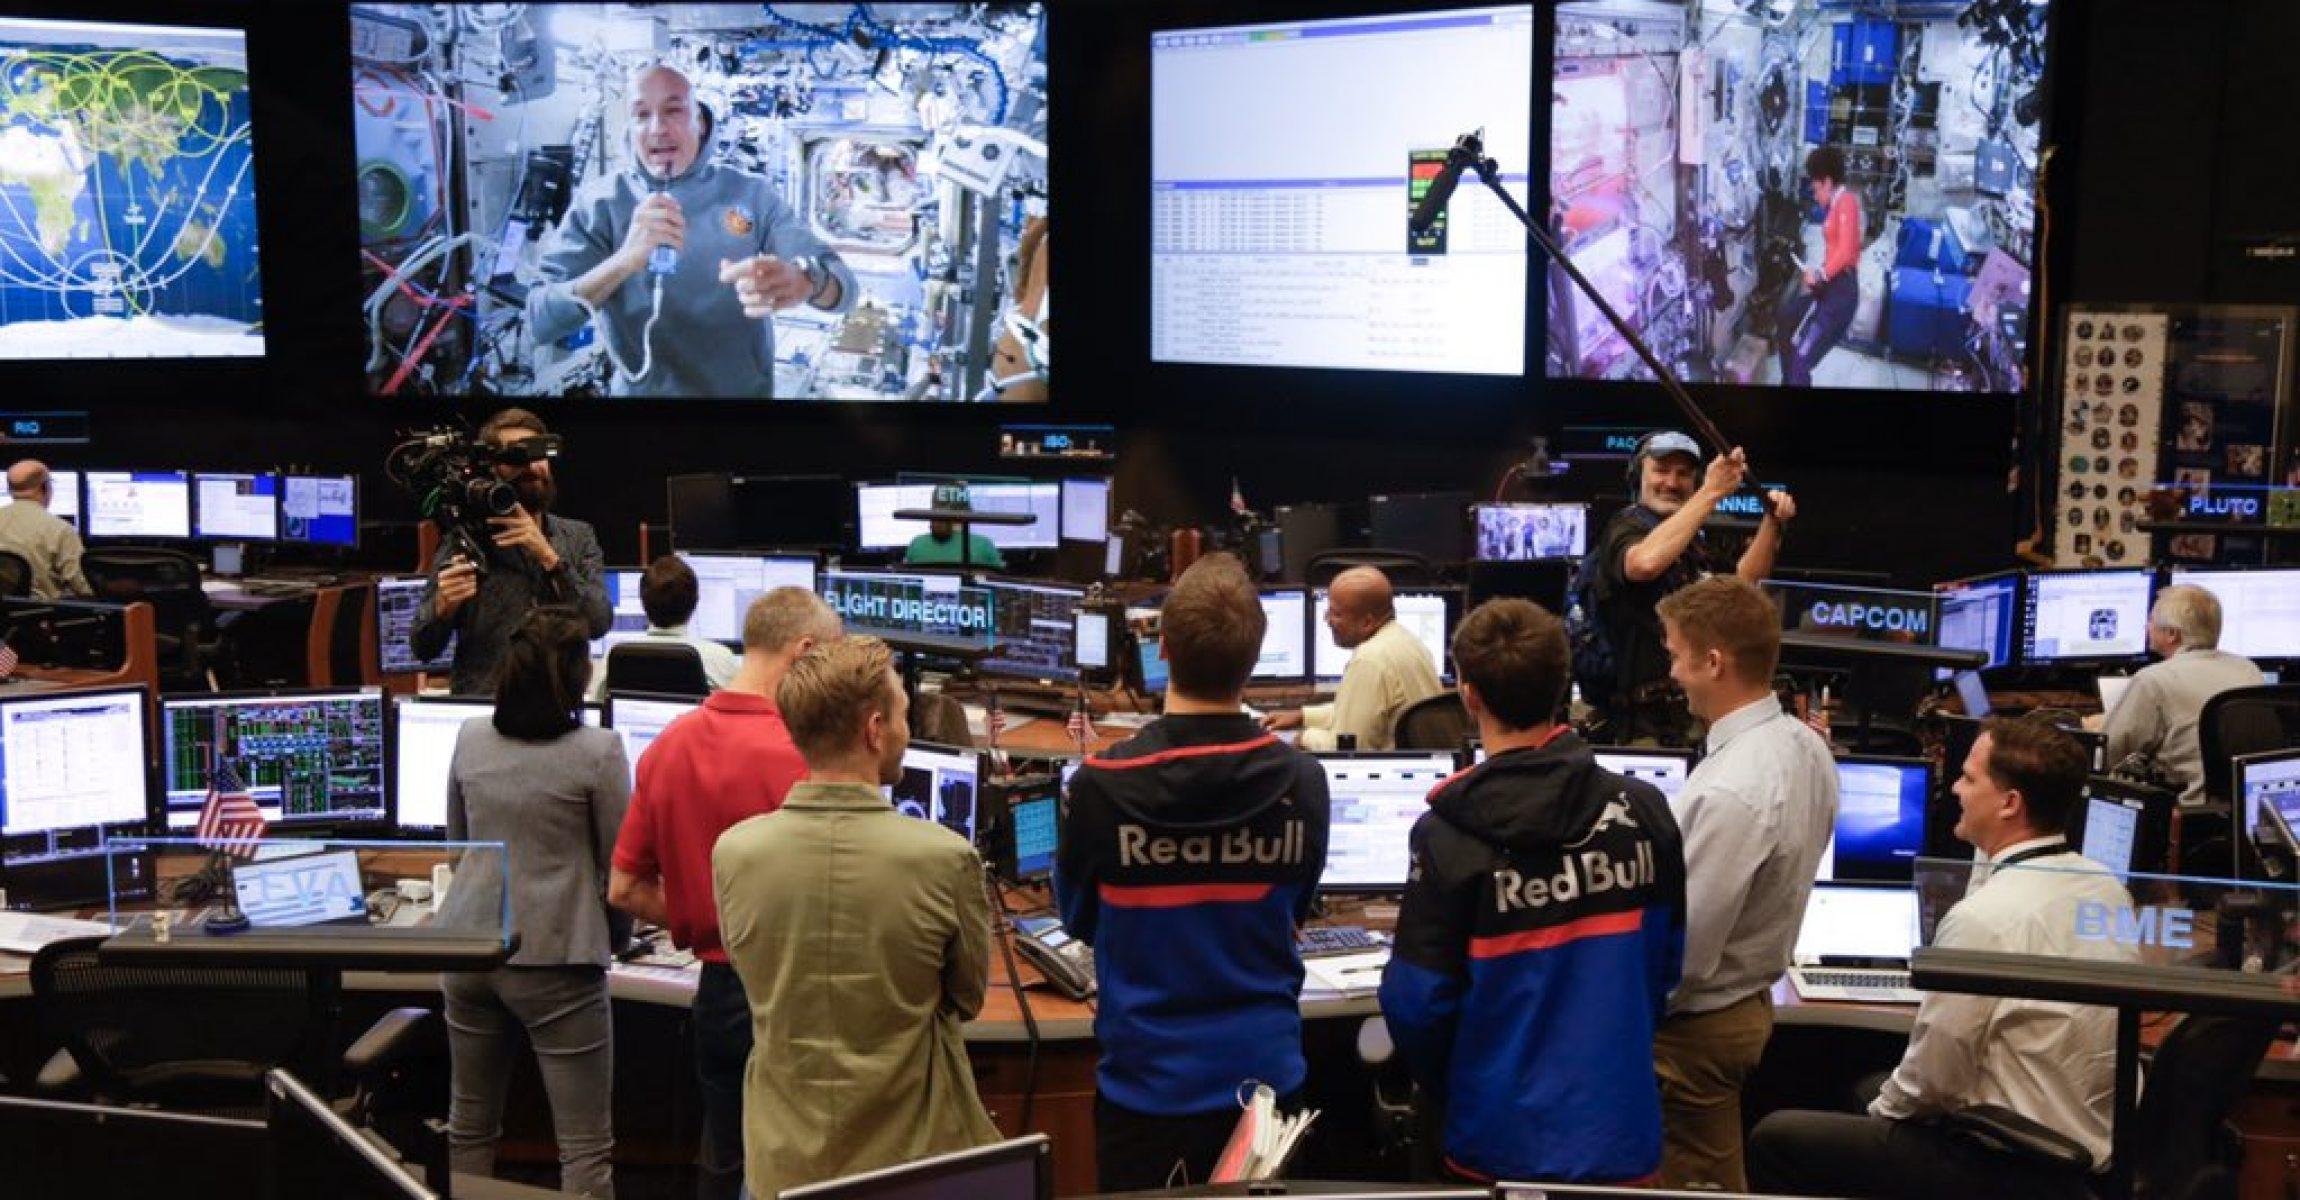 Pierre Gasly, Toro Rosso, Daniil Kvyat, NASA, Houston